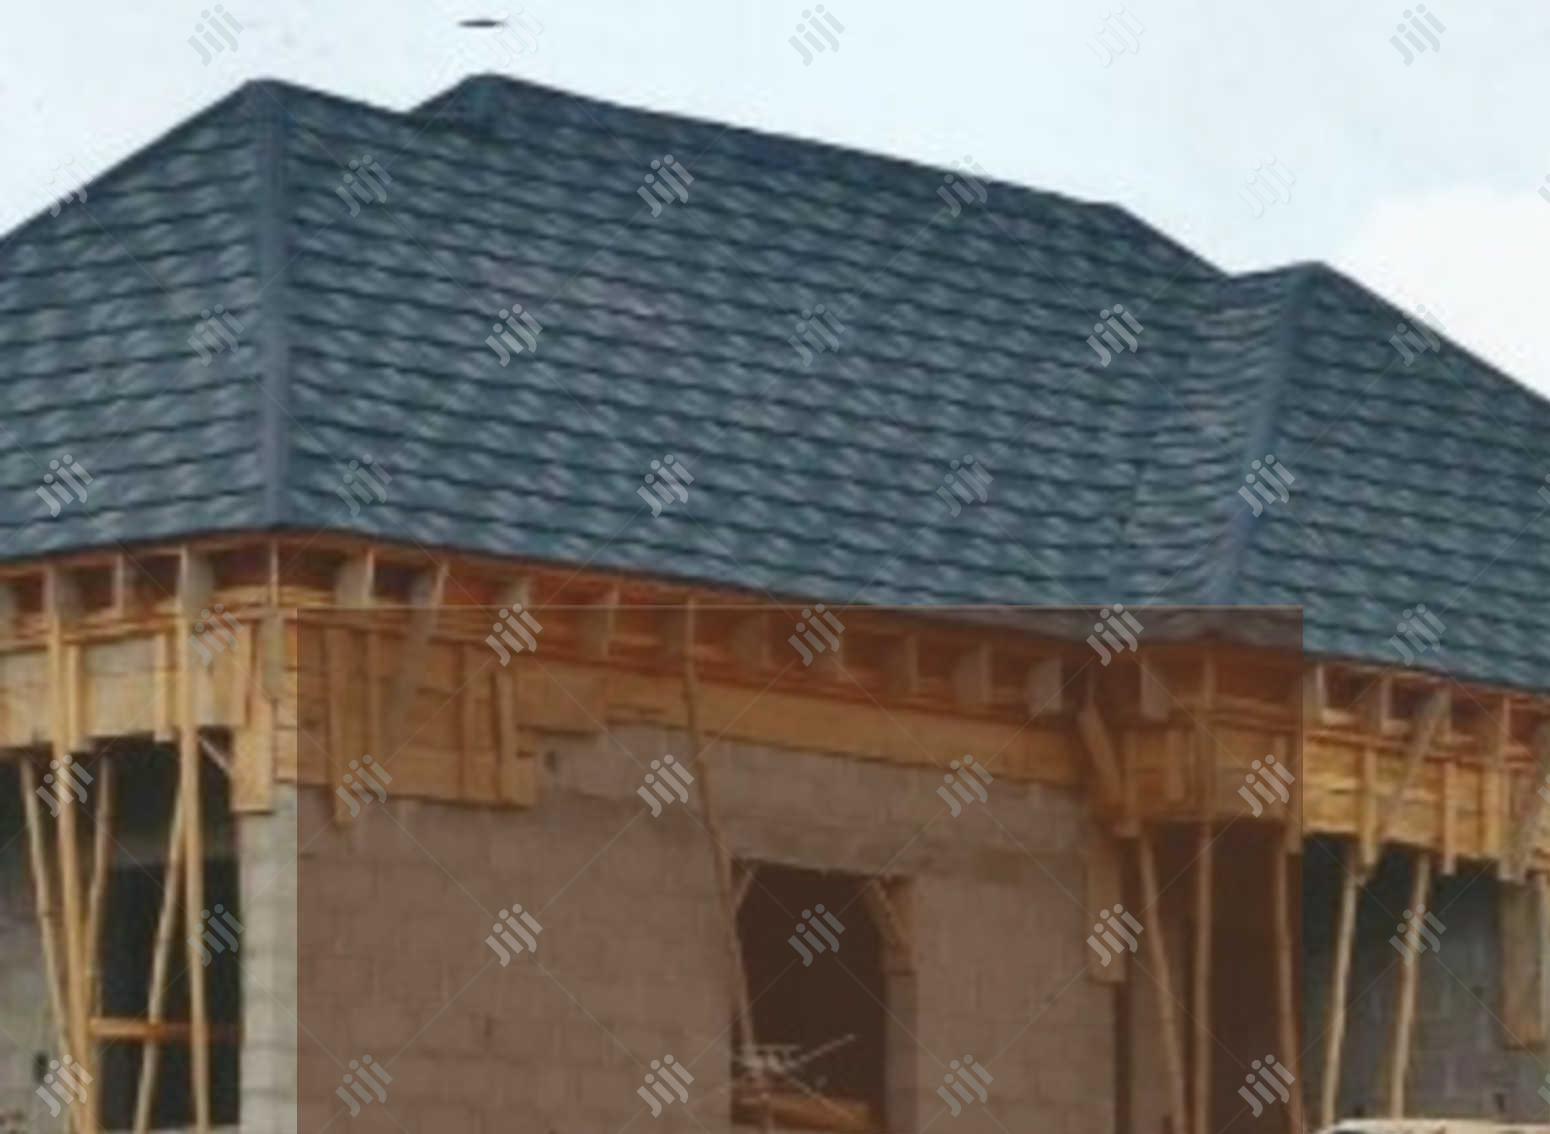 Heritage New Zealand Gerard Metro Tile Stone Coated Roof